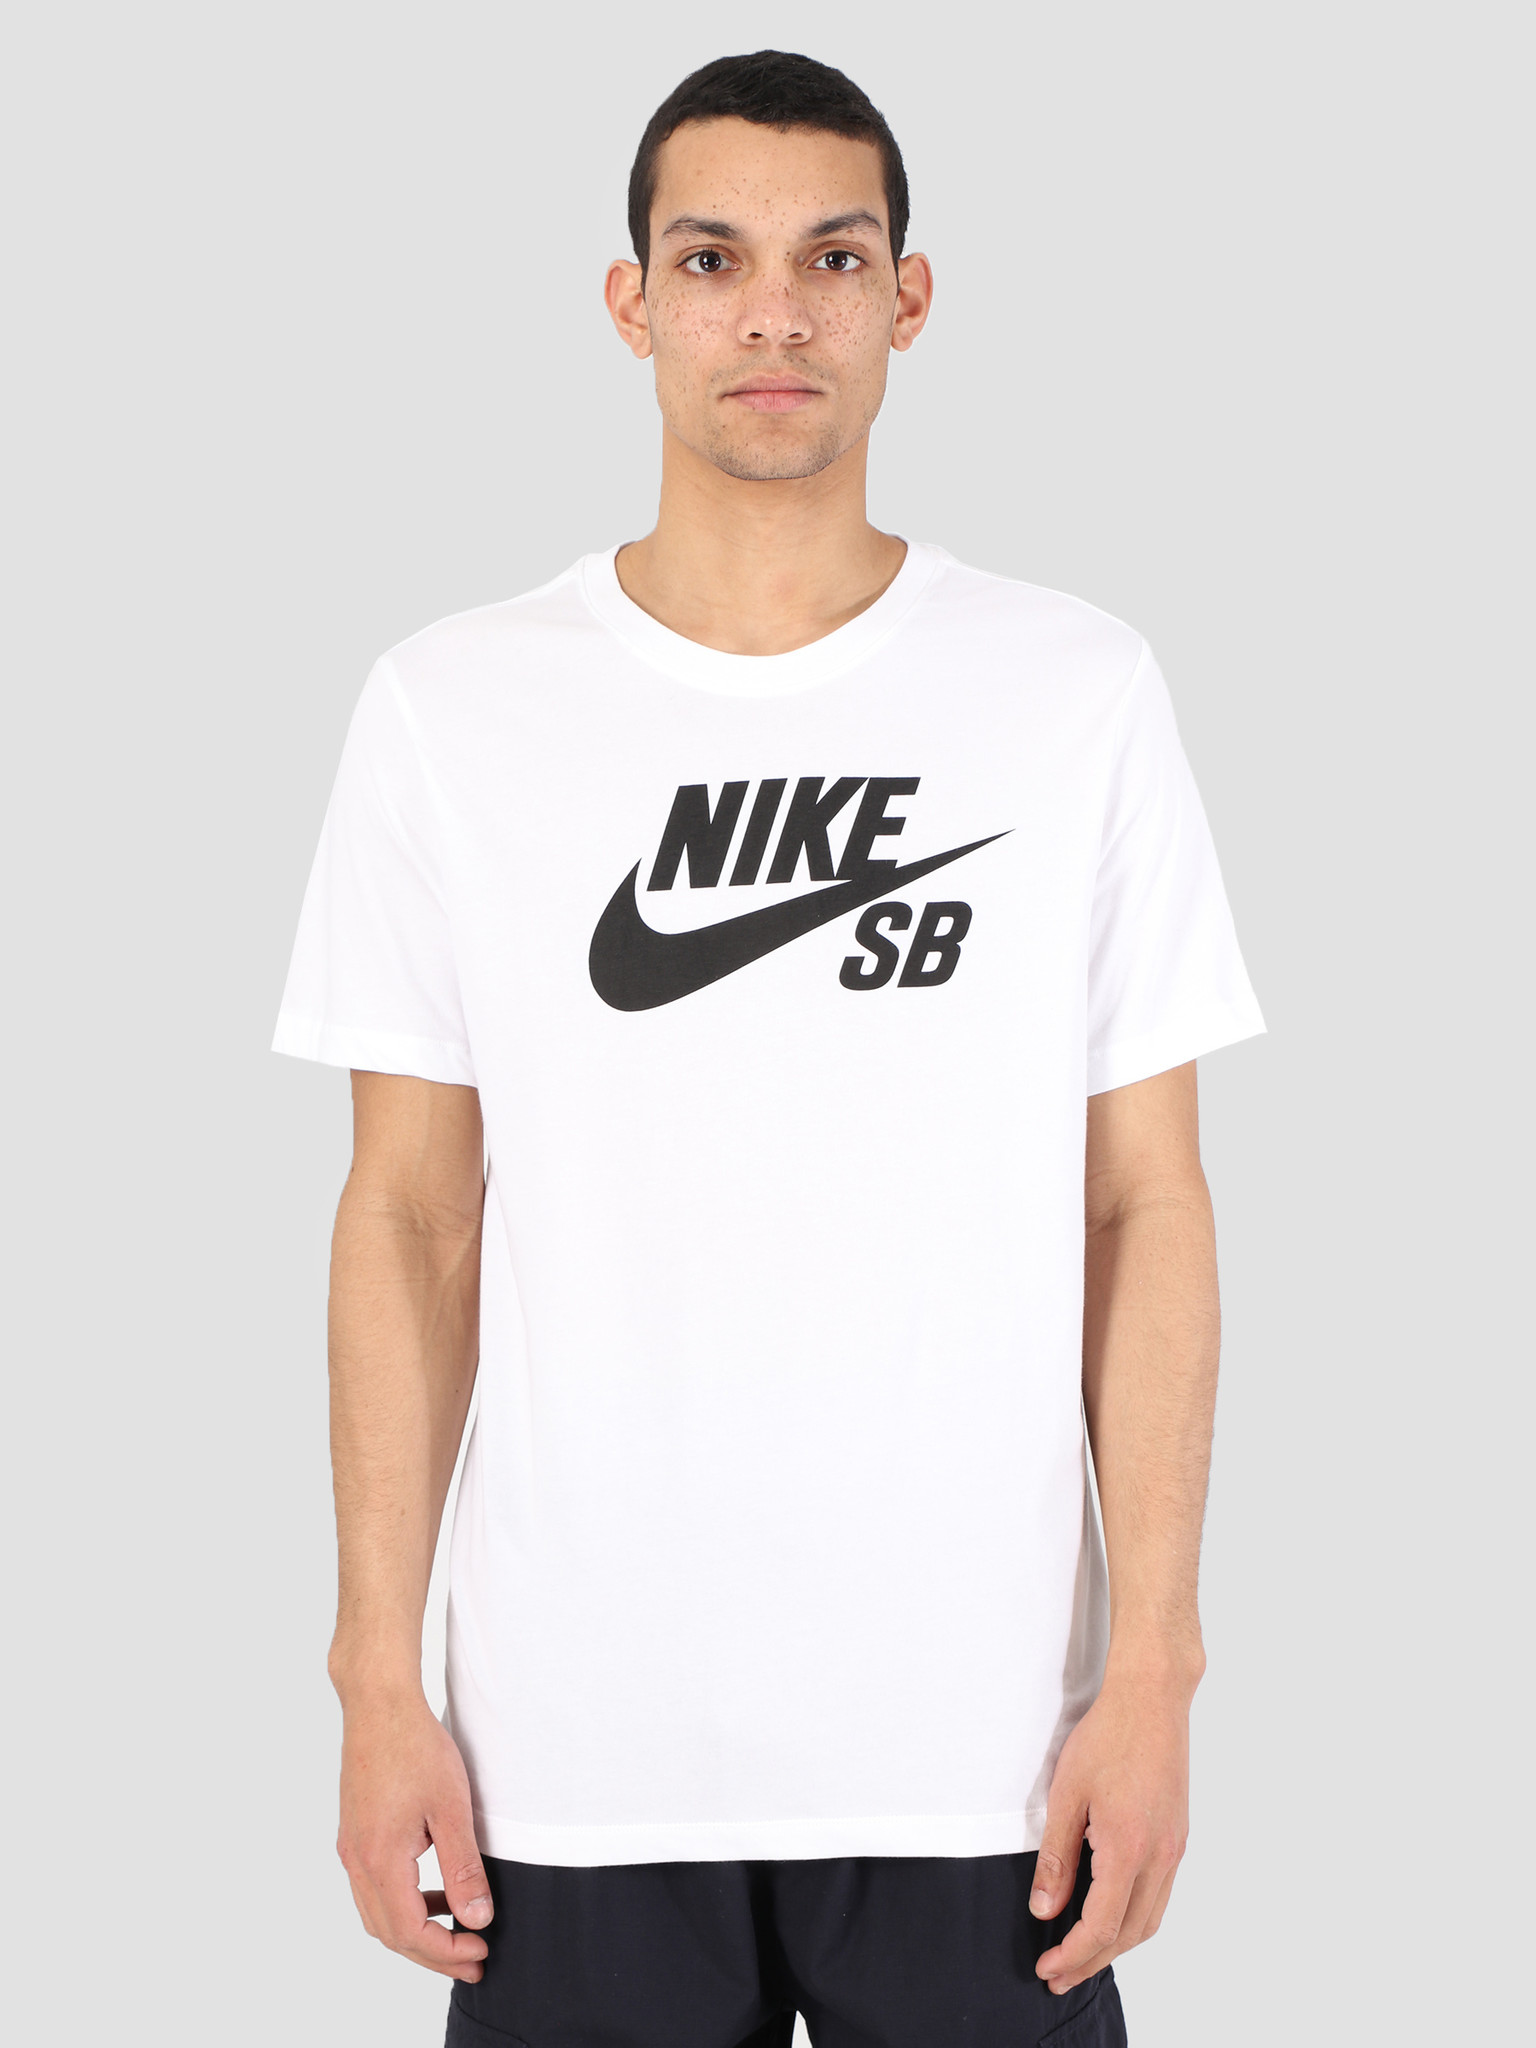 new style 36b34 c863a Nike Nike SB T-Shirt Dri-Fit White Black Ar4209-100